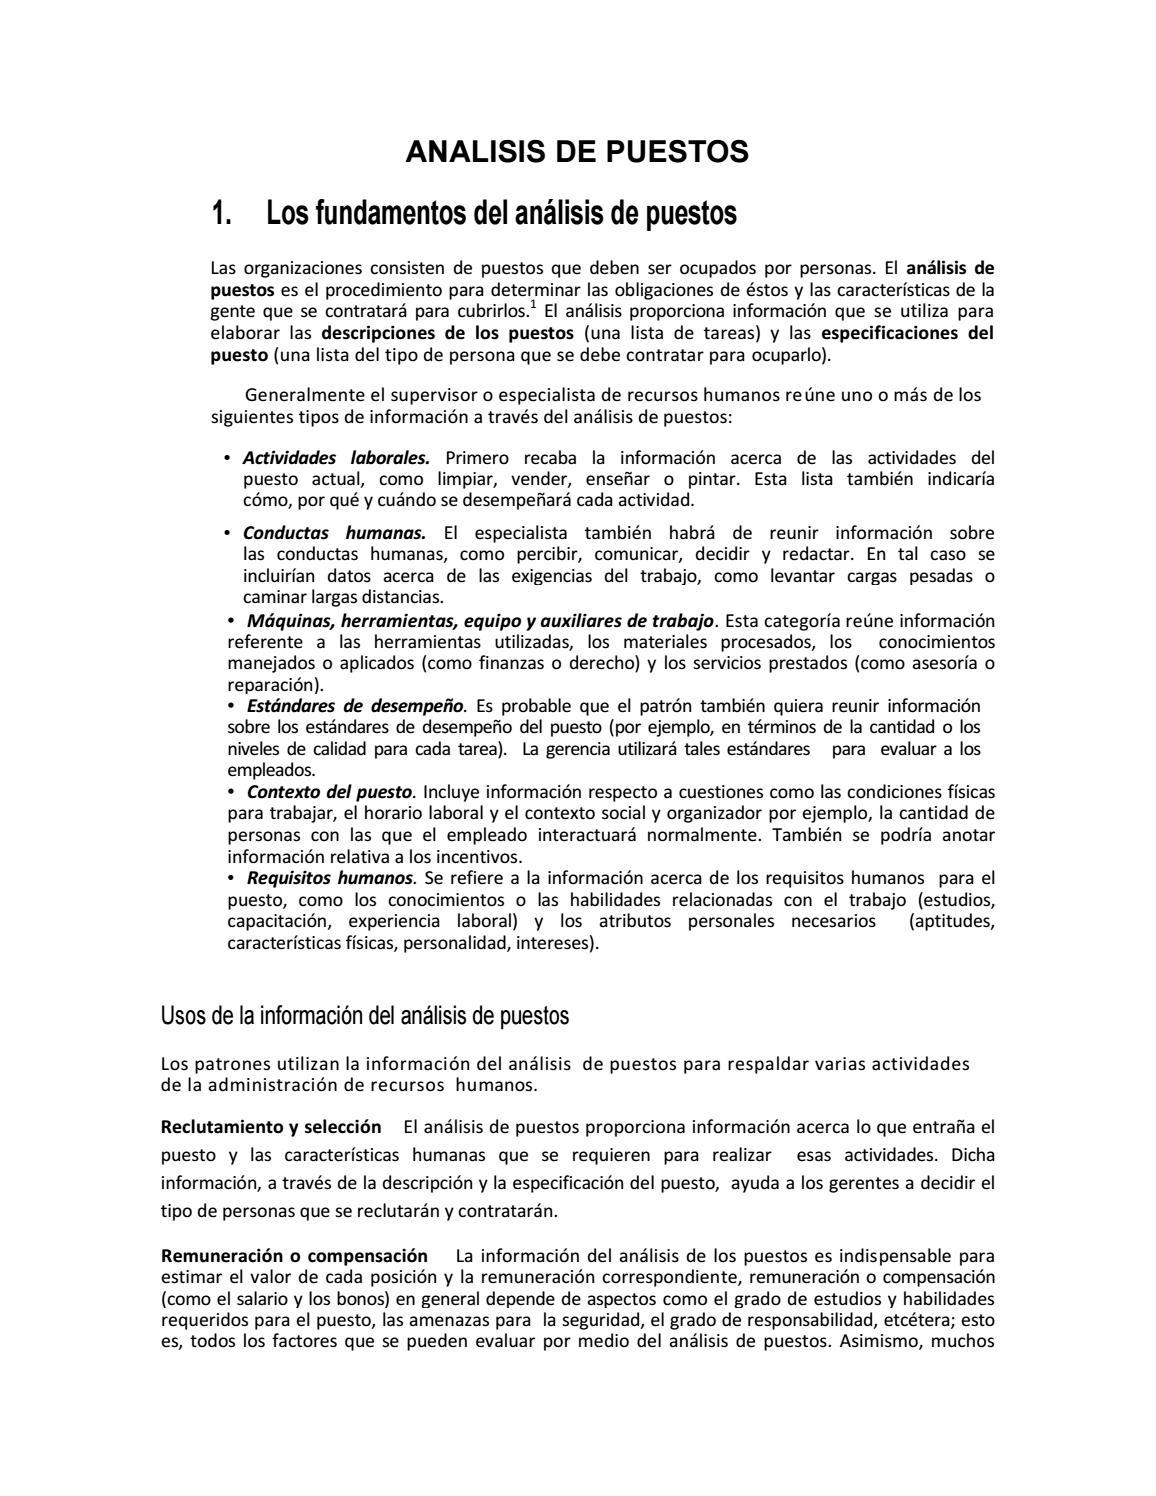 Analisis de puestos by Lissette Alvarez - issuu